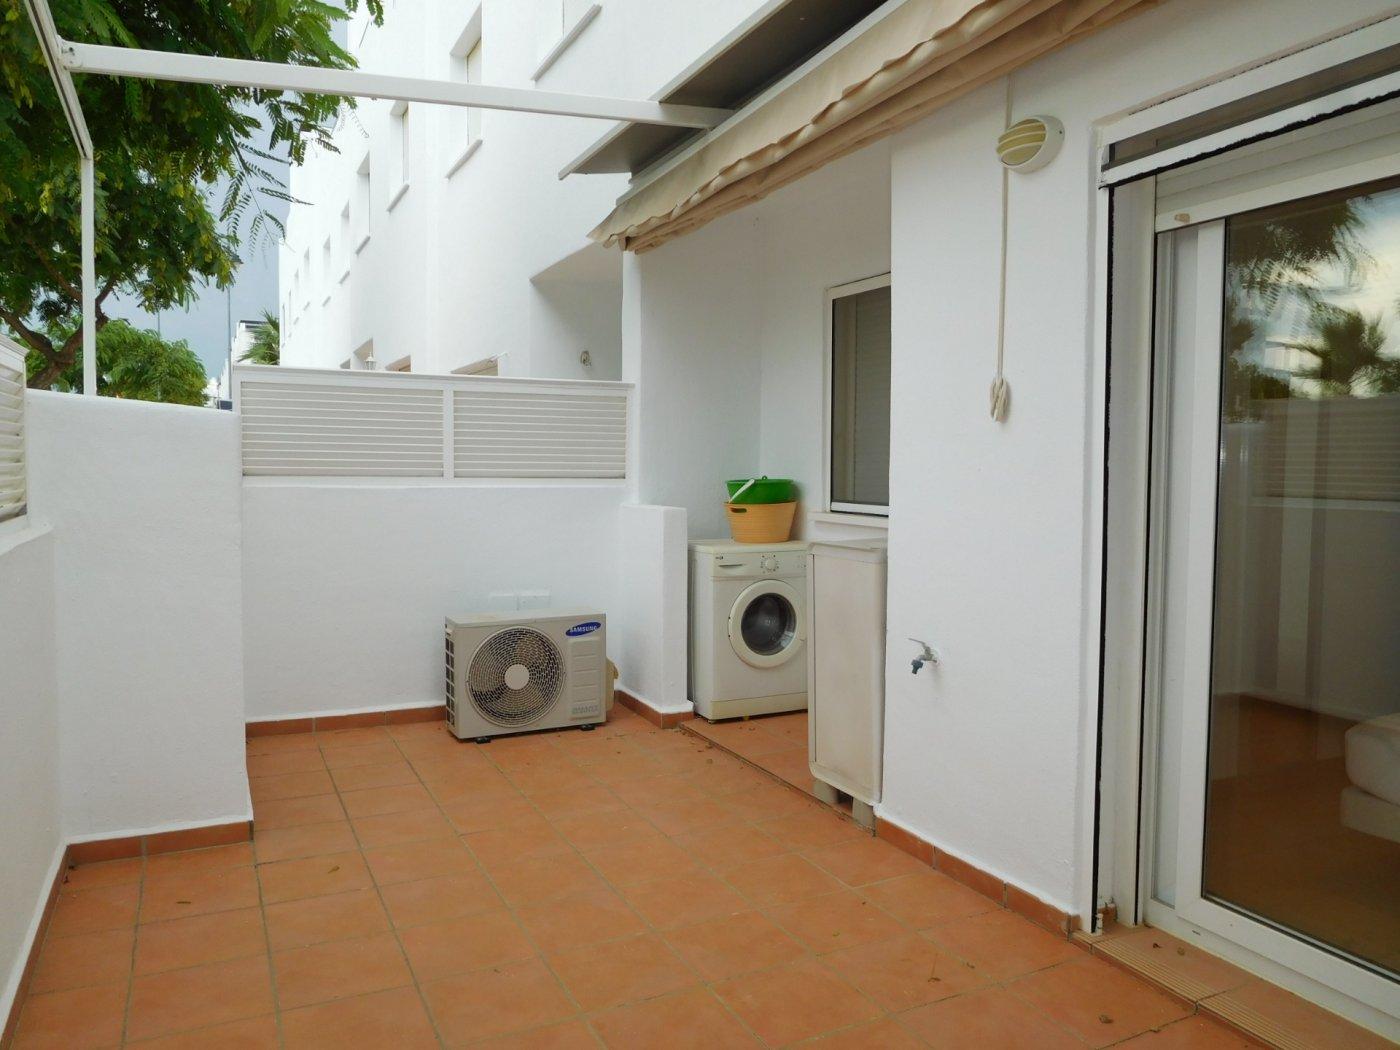 Gallery Image 14 of Apartment For rent in Condado De Alhama, Alhama De Murcia